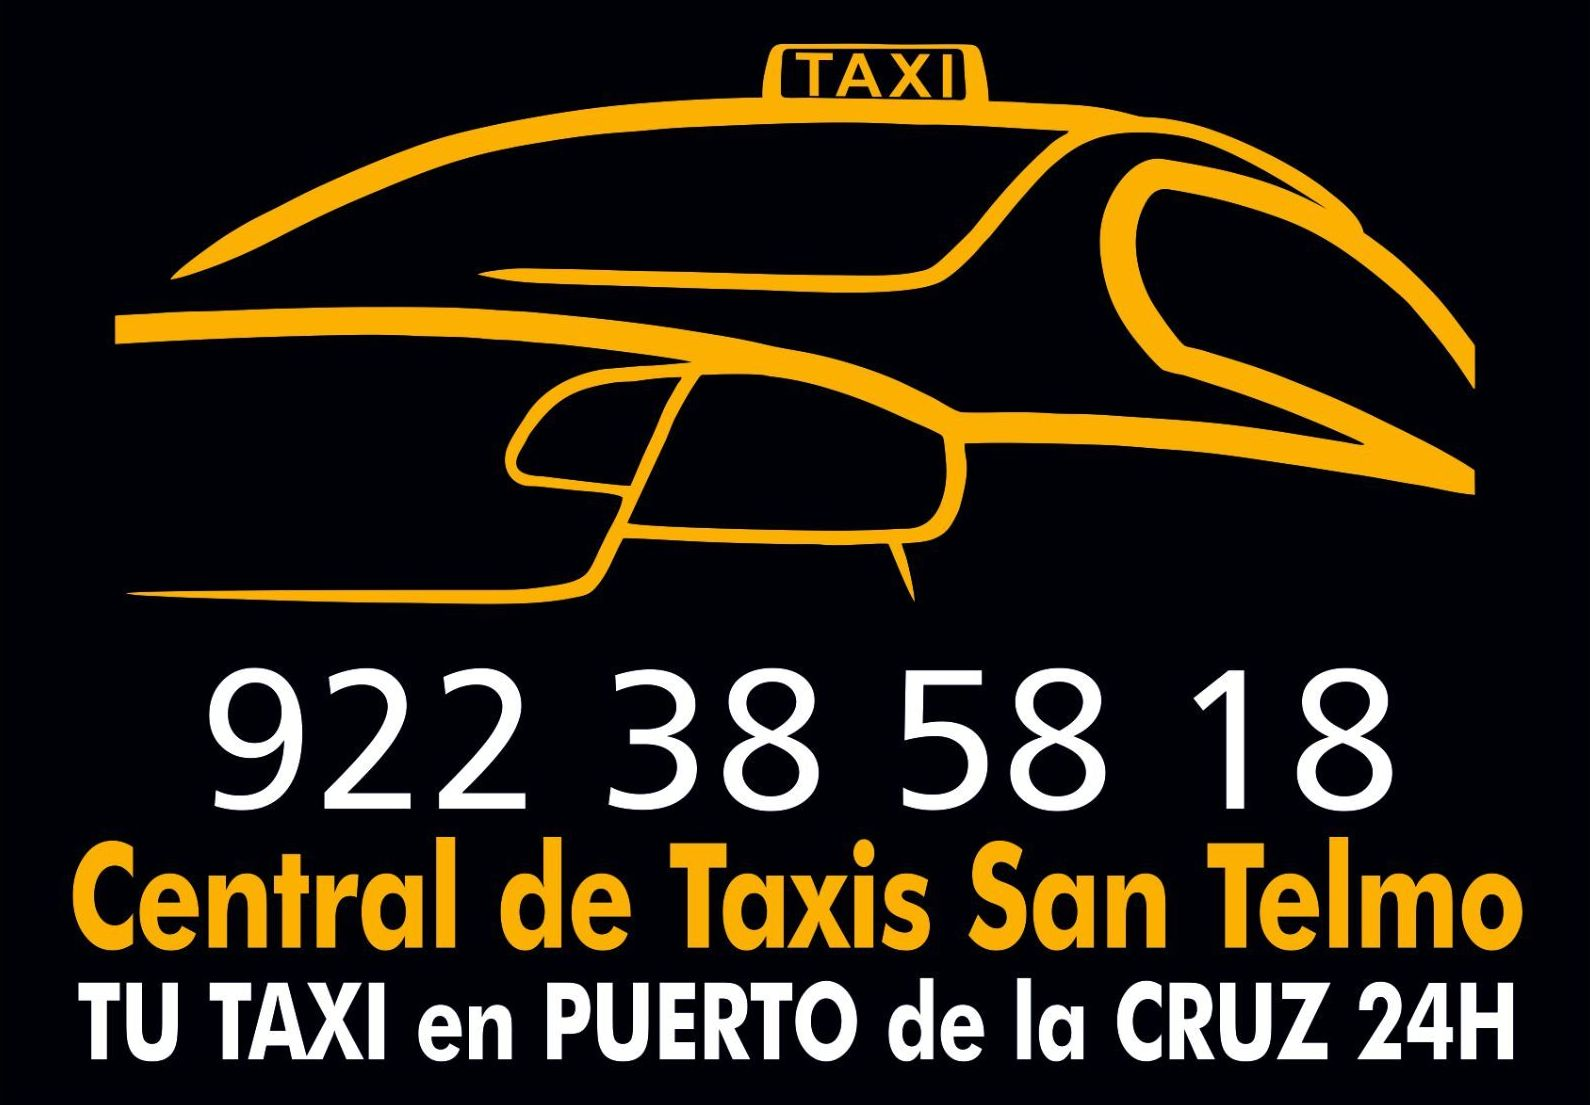 Pide tu Taxi